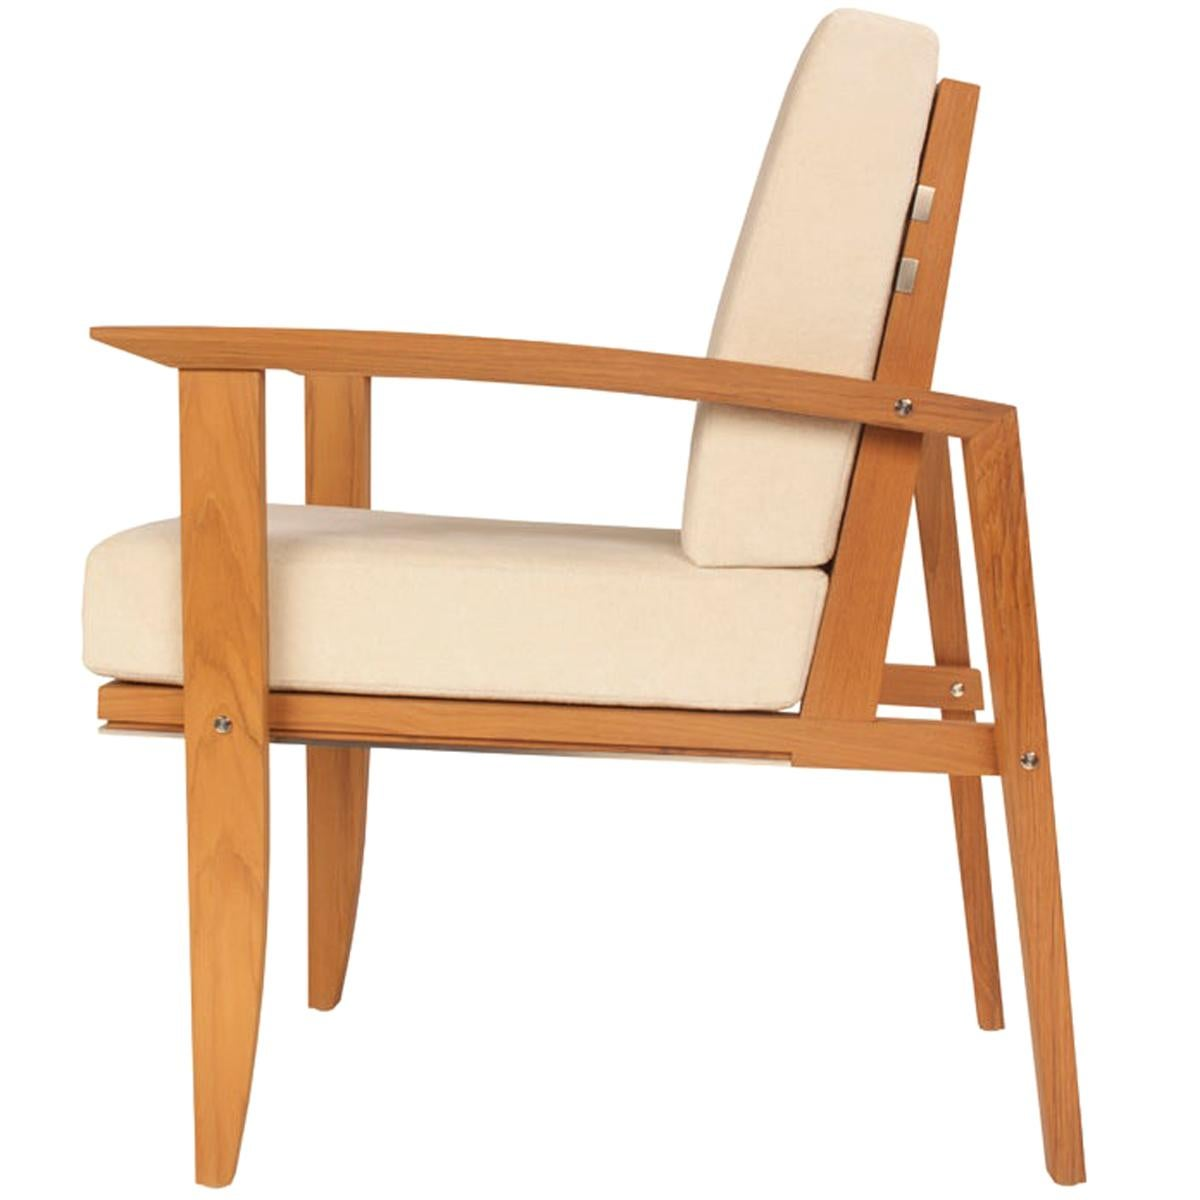 Pollaro Custom Made Teak and Titanium Exterior Dining Armchair